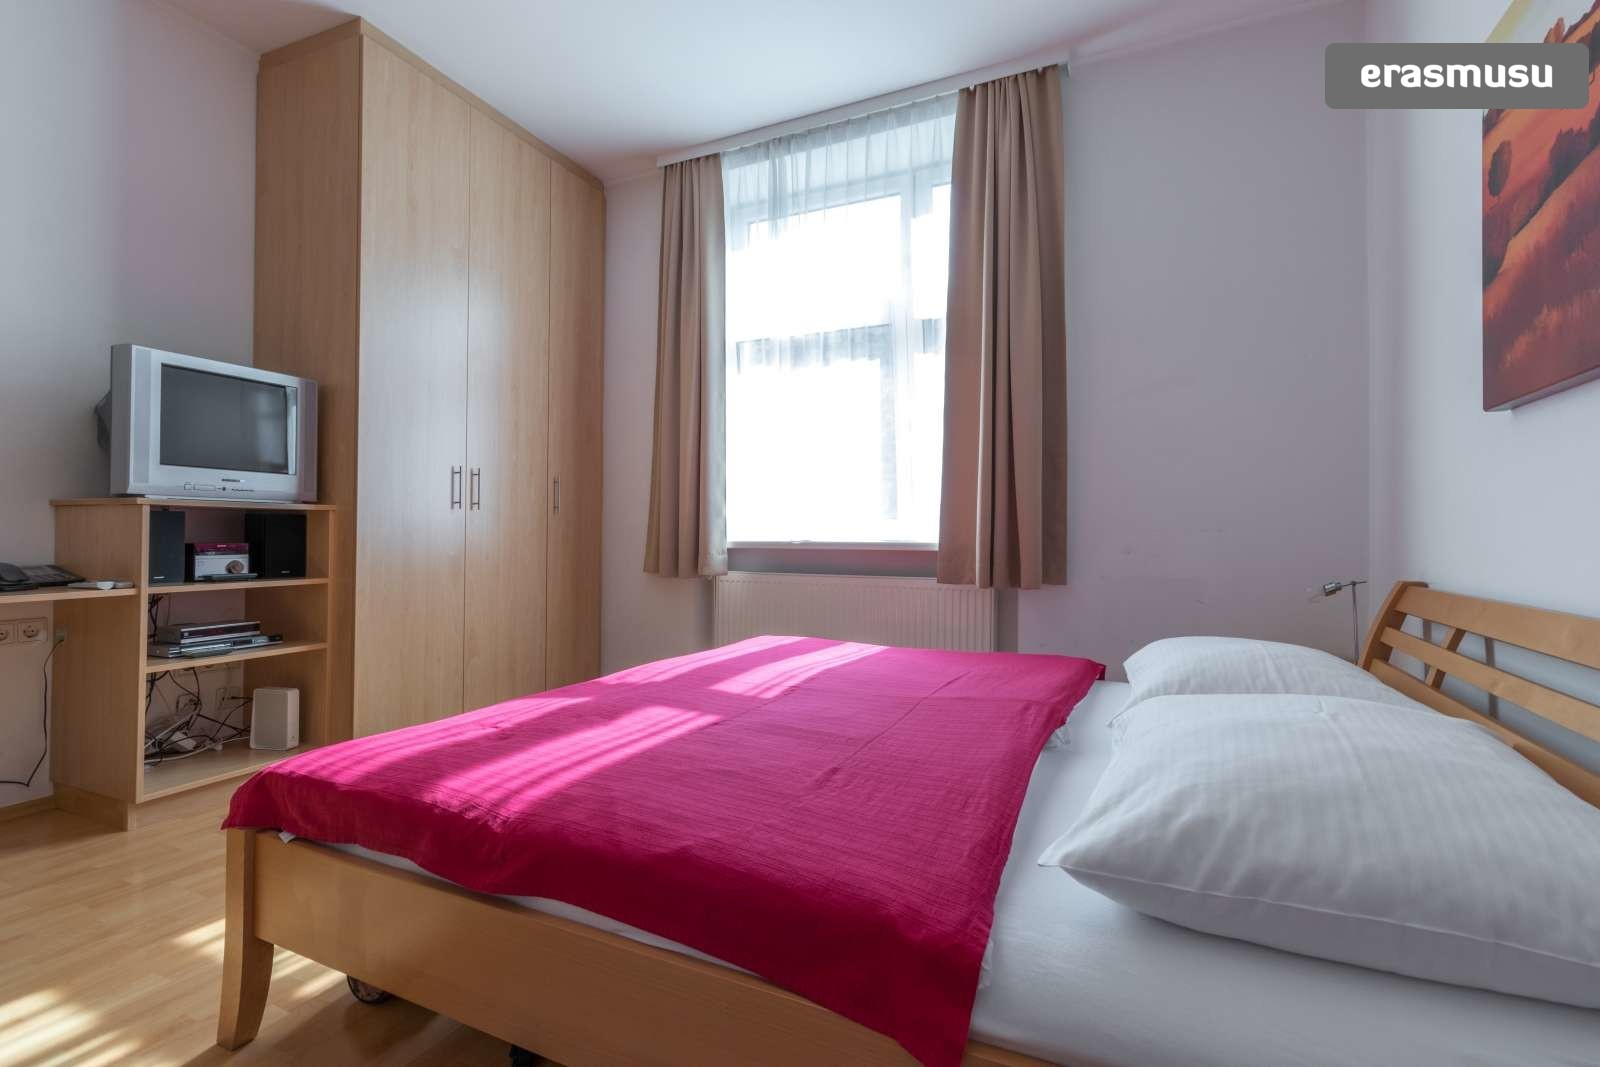 sunny-studio-apartment-rent-near-bohemian-prater-favoriten-cc3e4